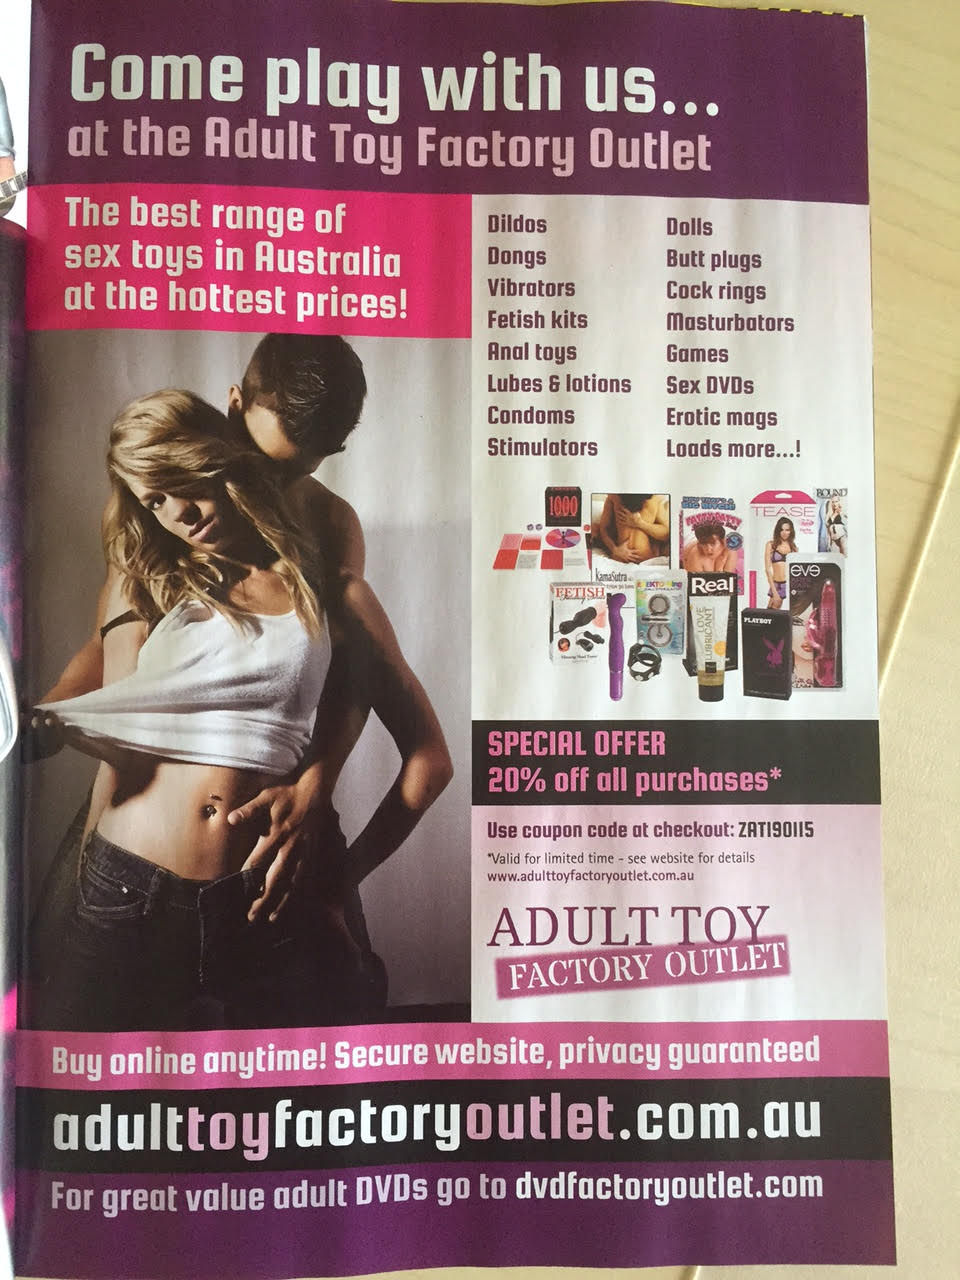 Zoo_Weekly_AdultToyWebsite_ad.jpg